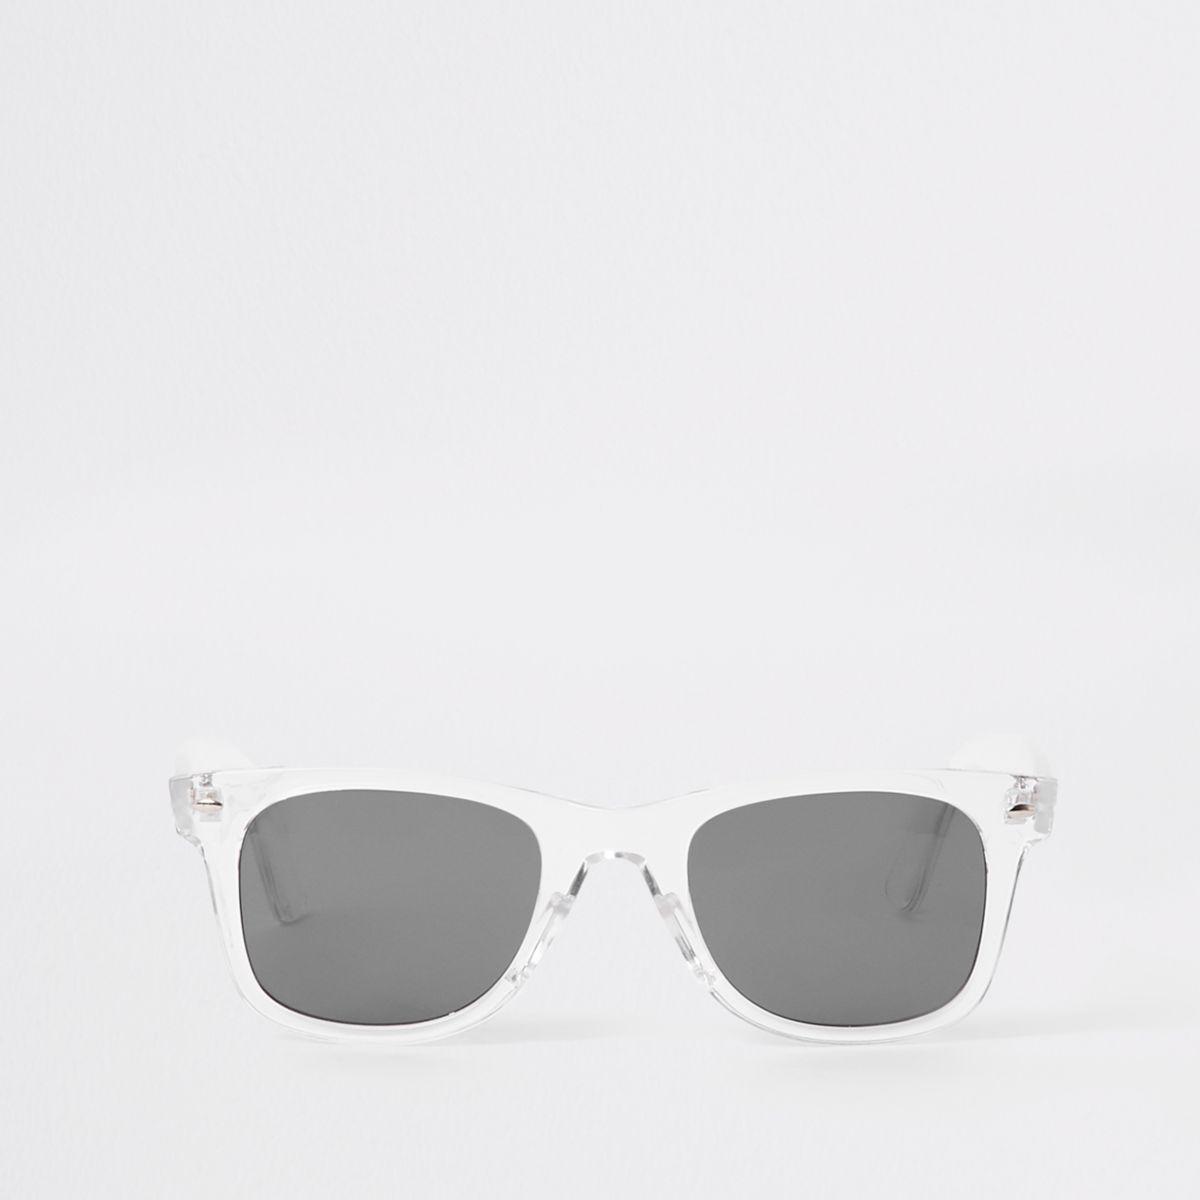 Clear frame retro sunglasses